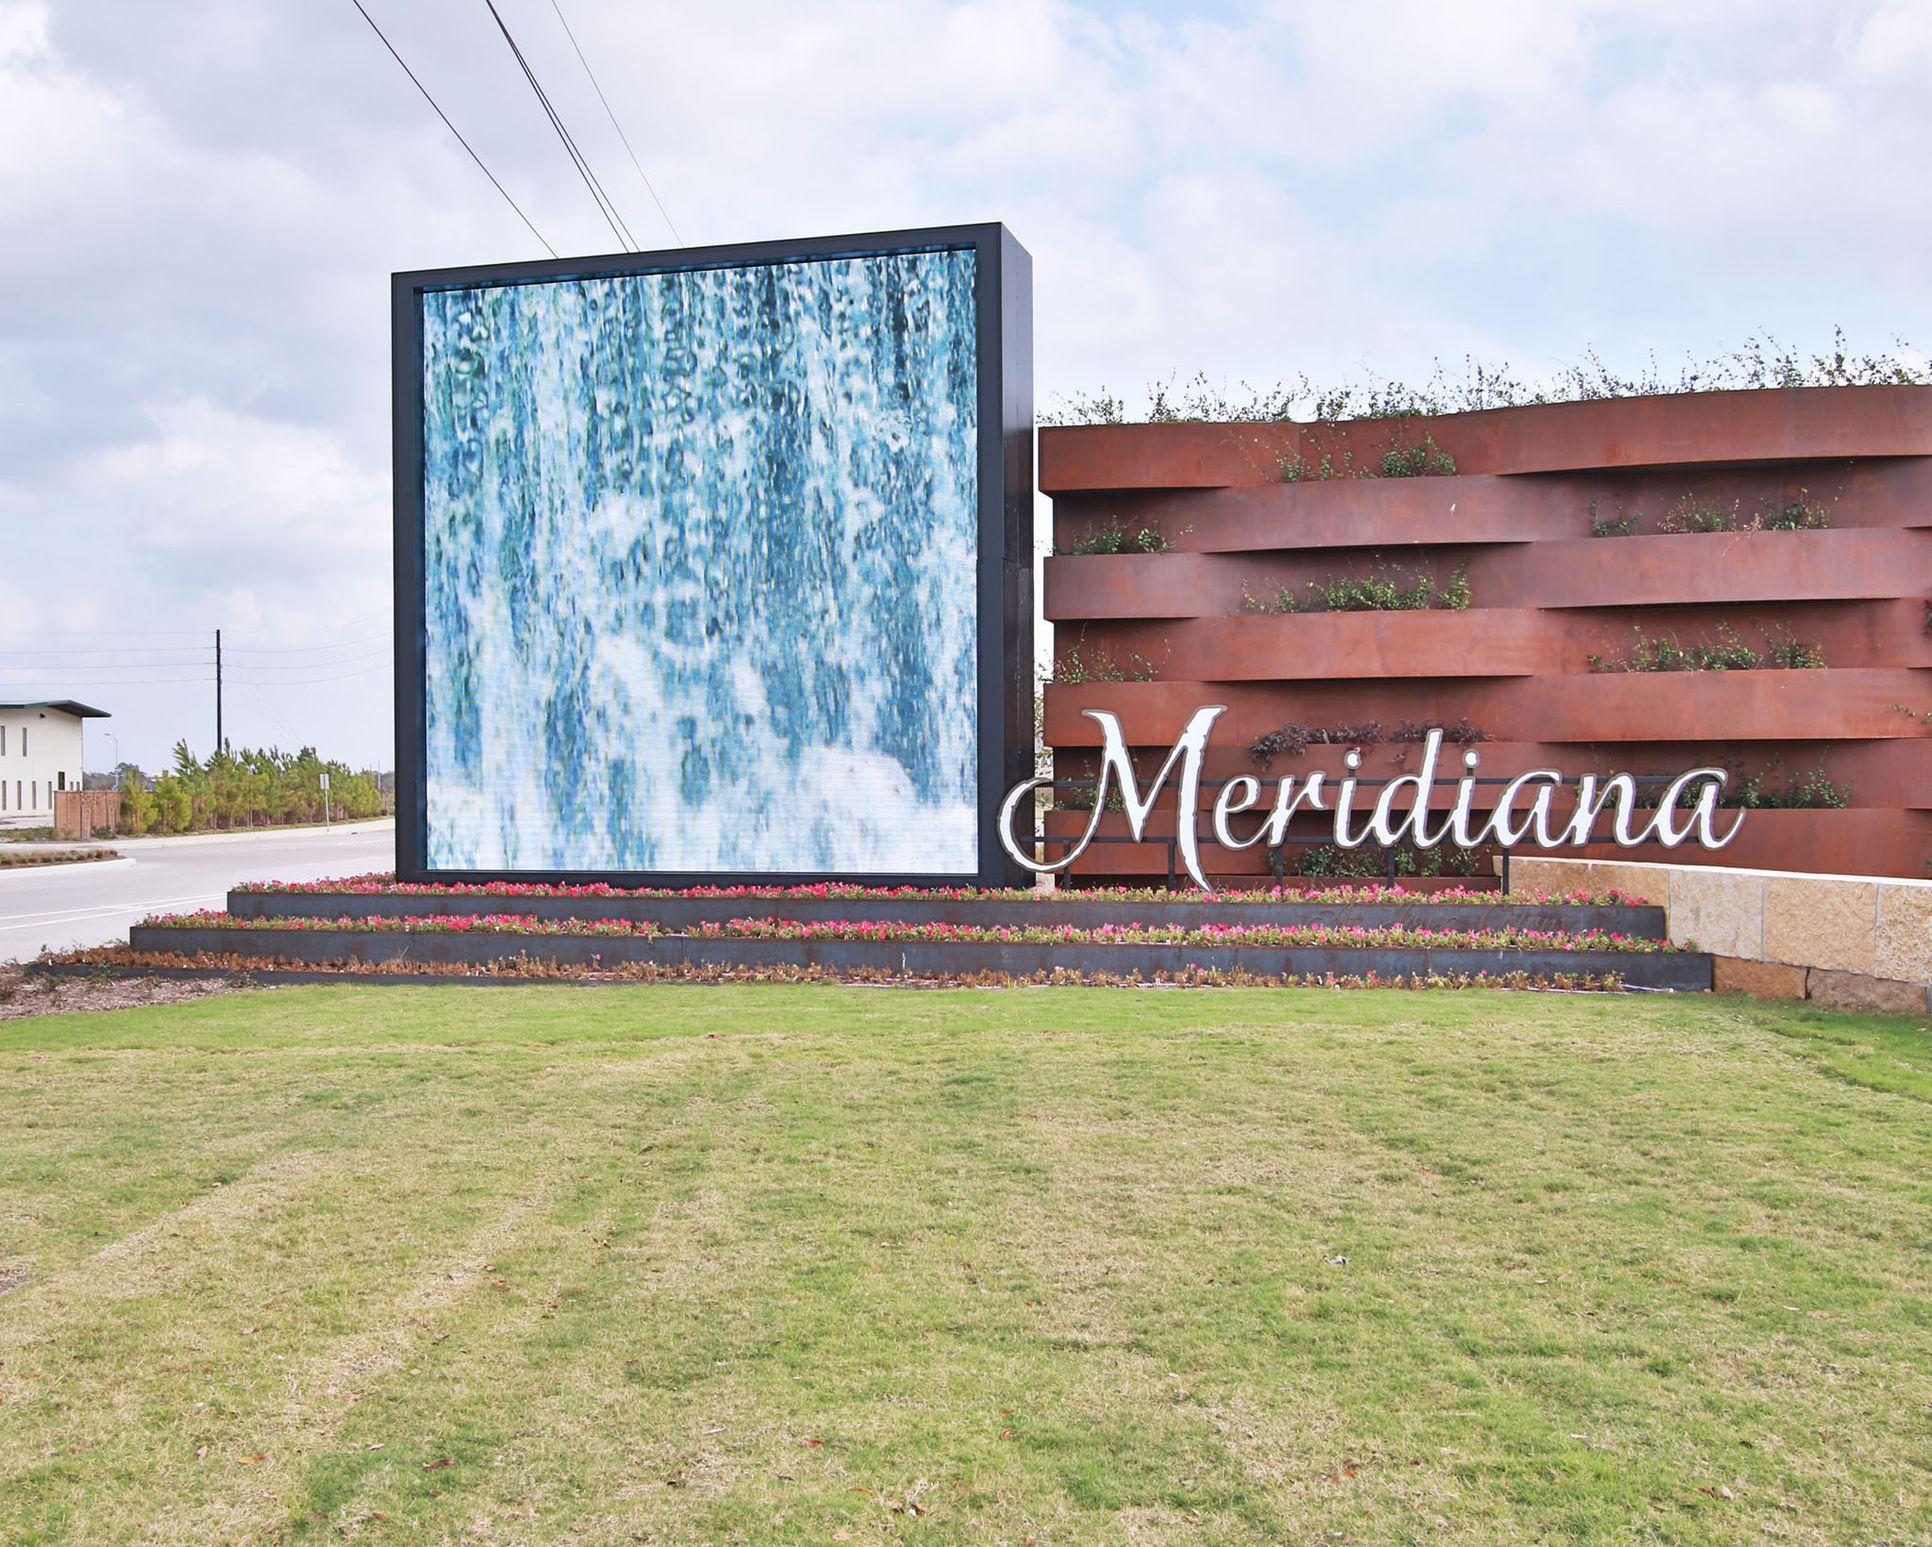 Meridiana 50',77583